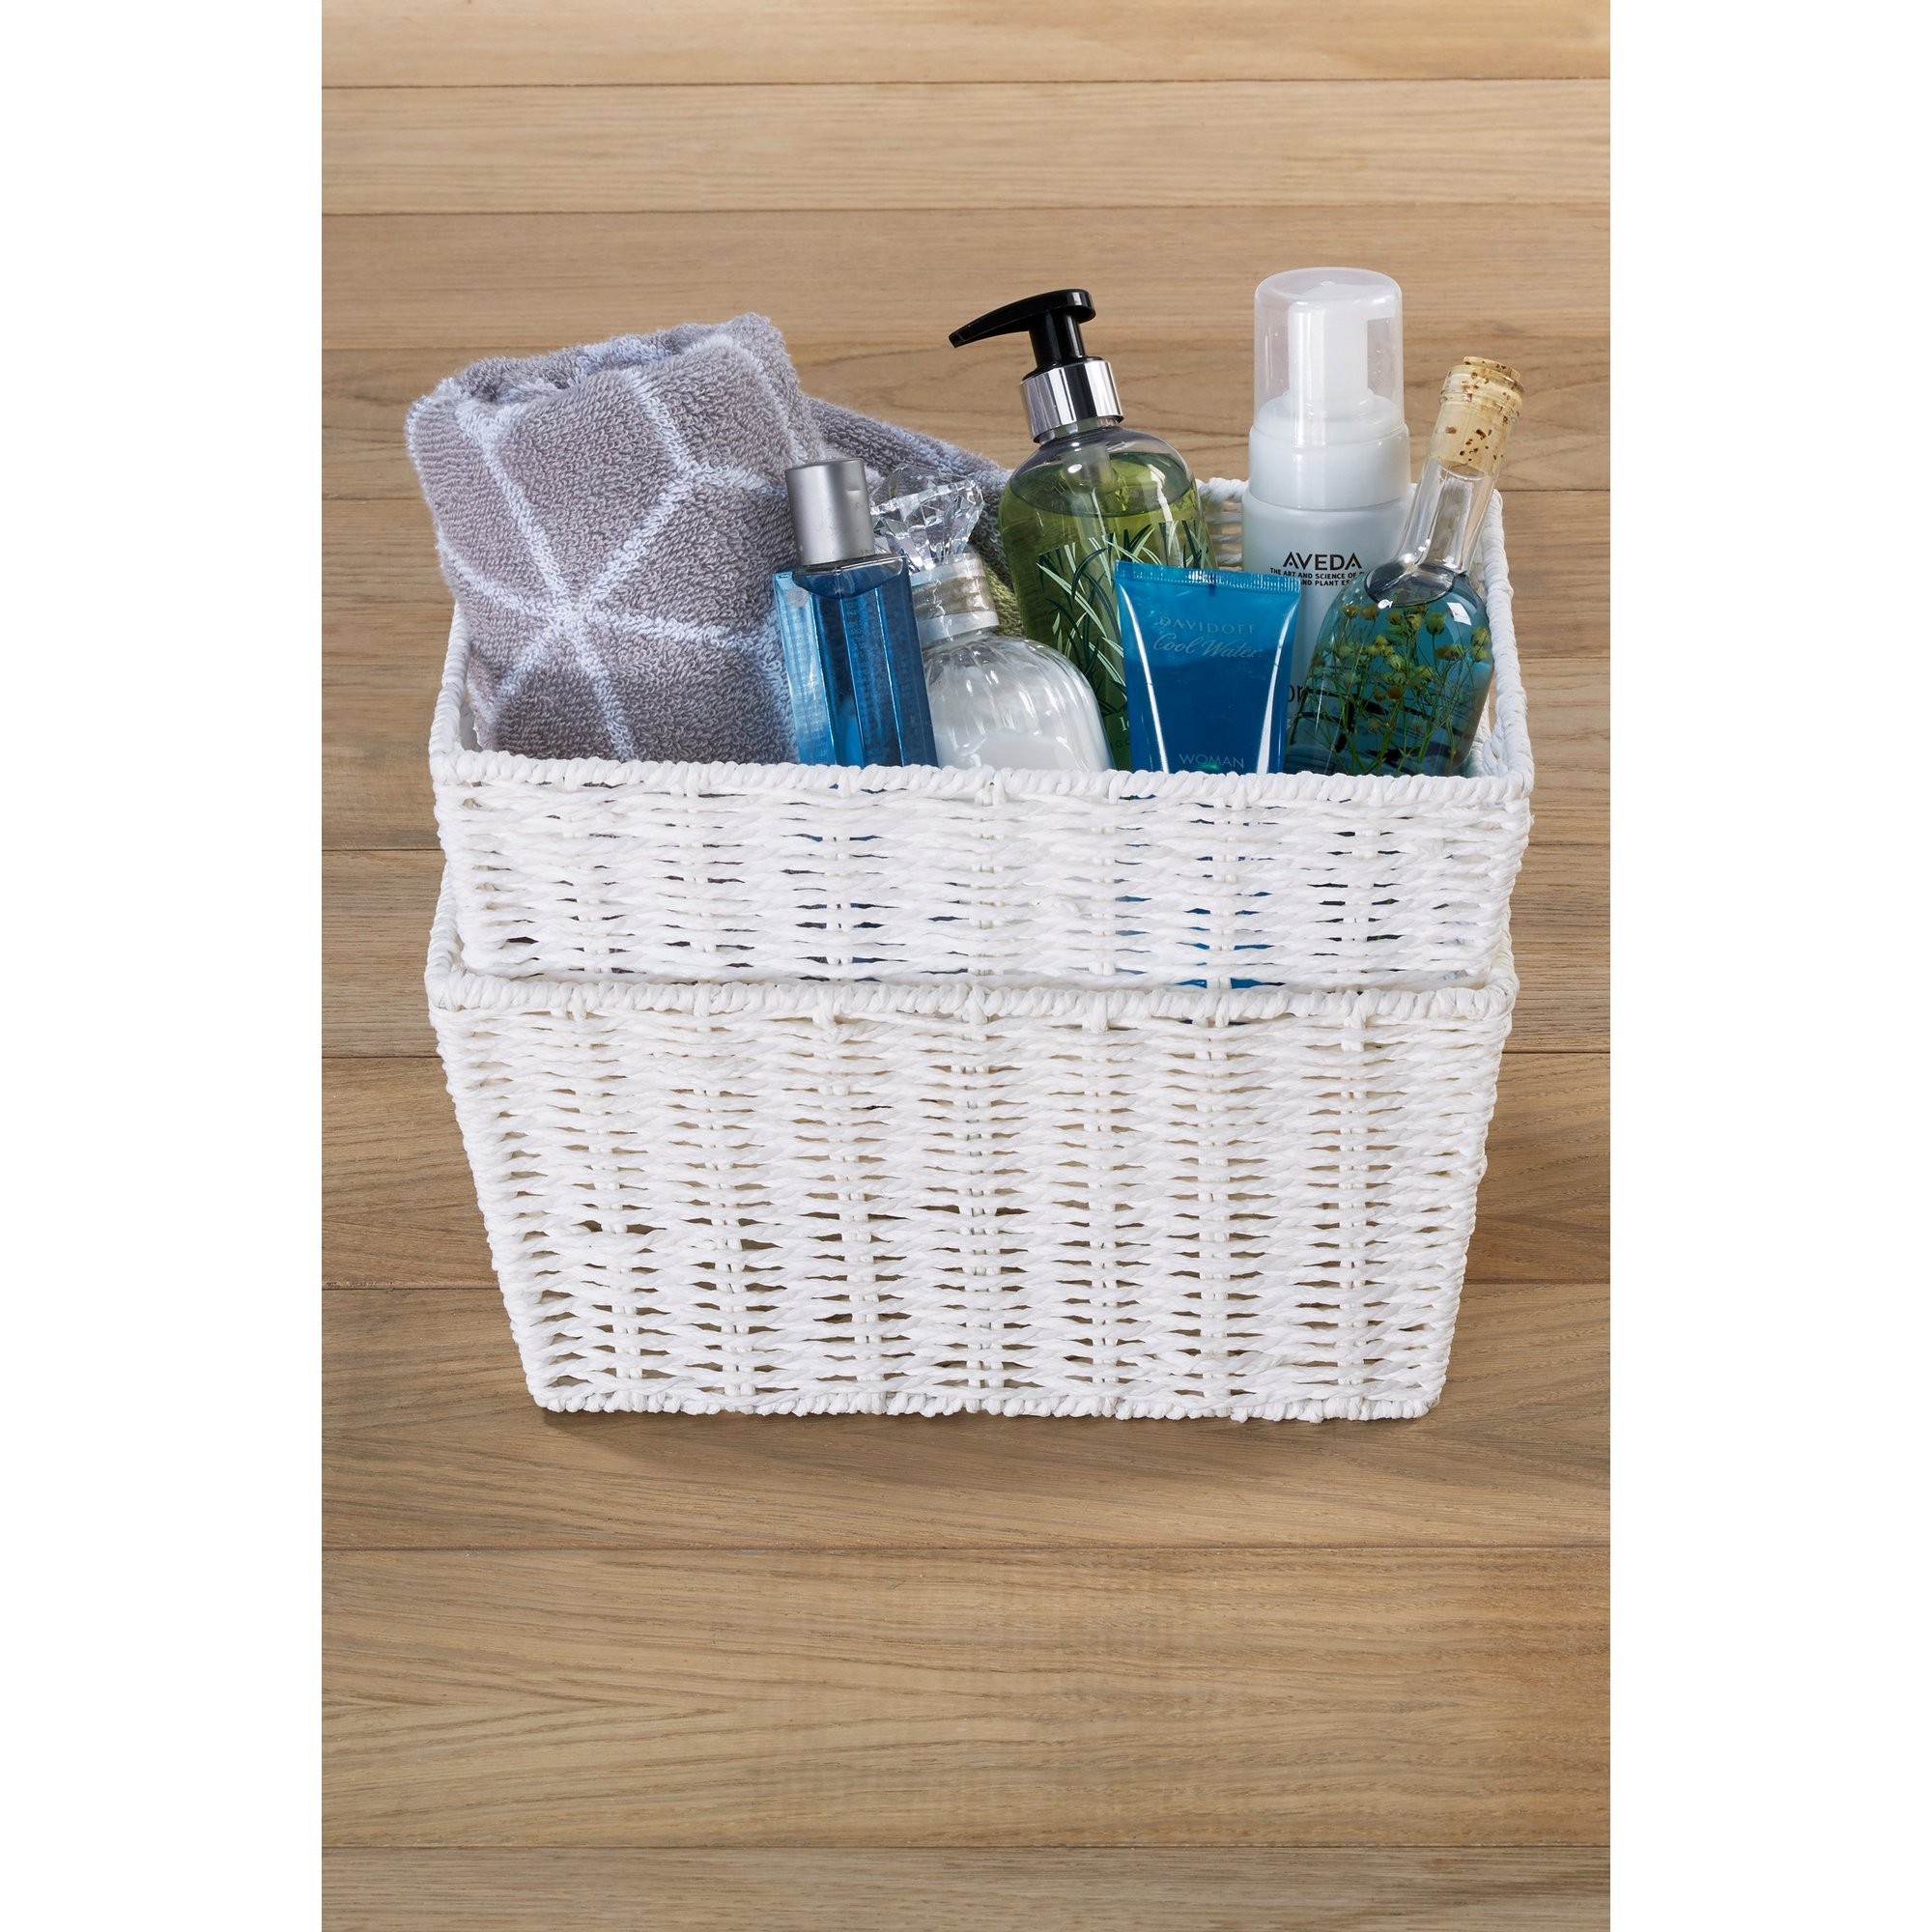 Image of 2 Piece Bathroom Storage Baskets